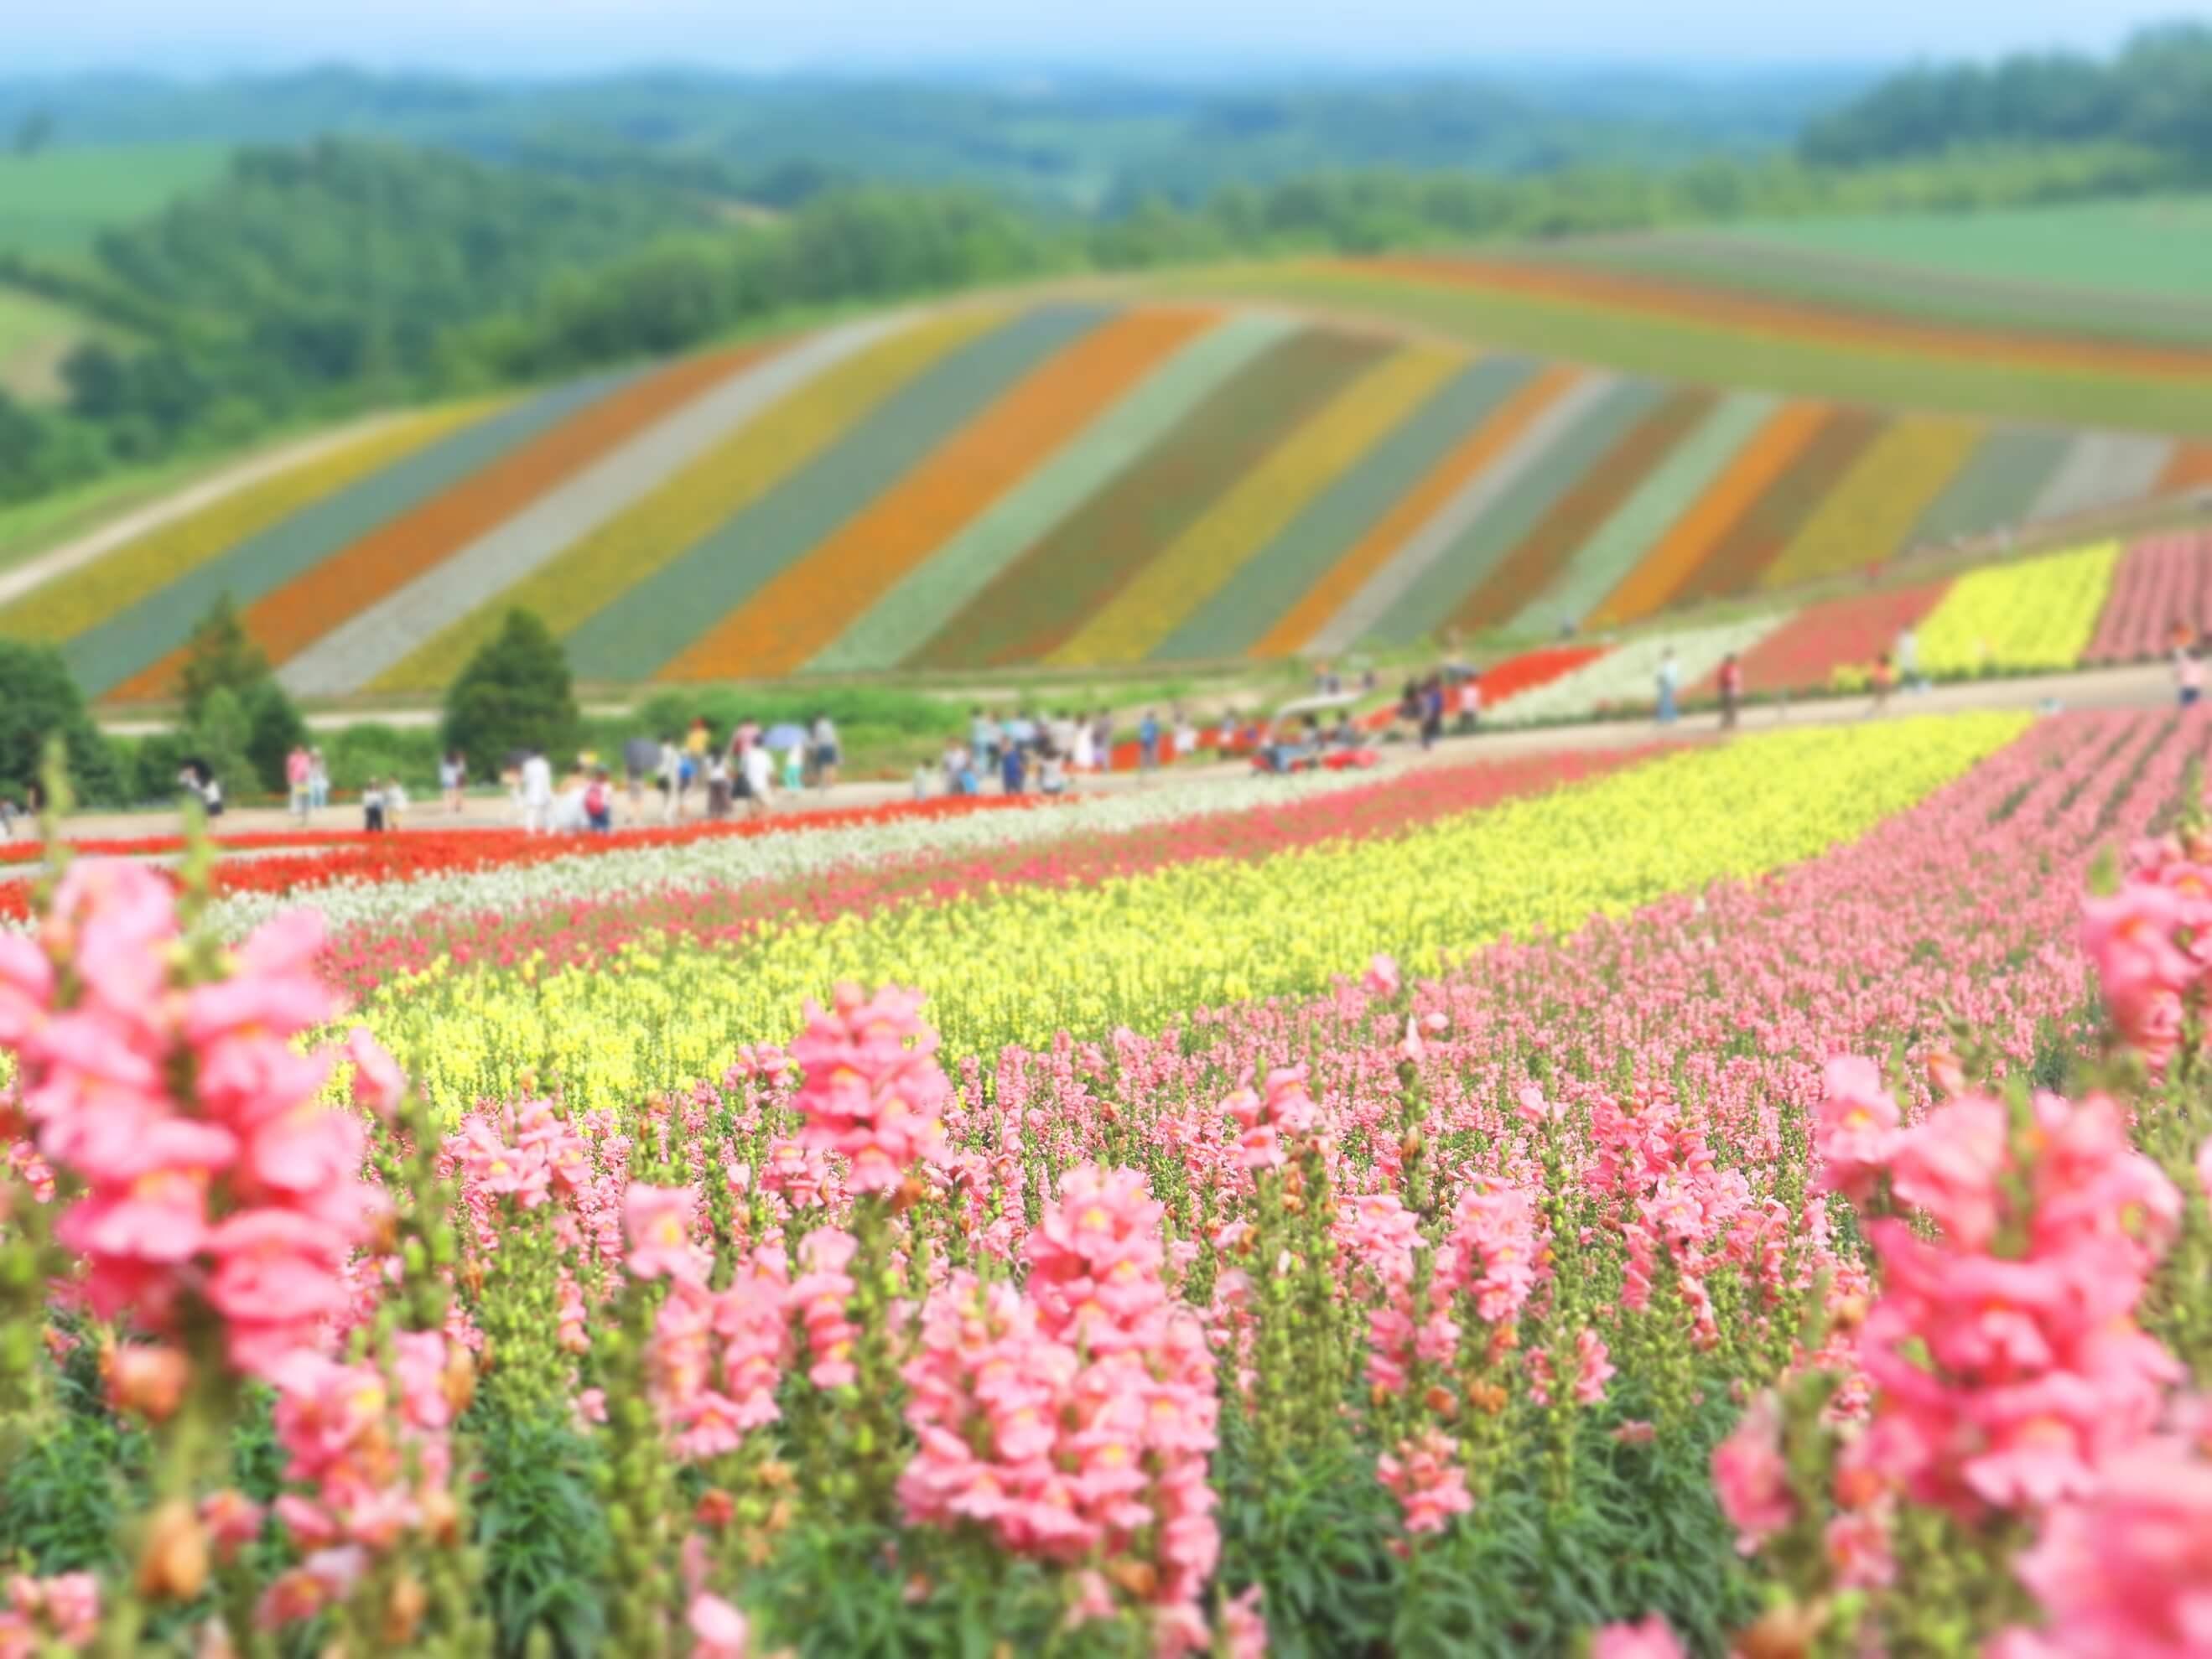 shikisai tepesi - kuzey japonya gezilecek yerler